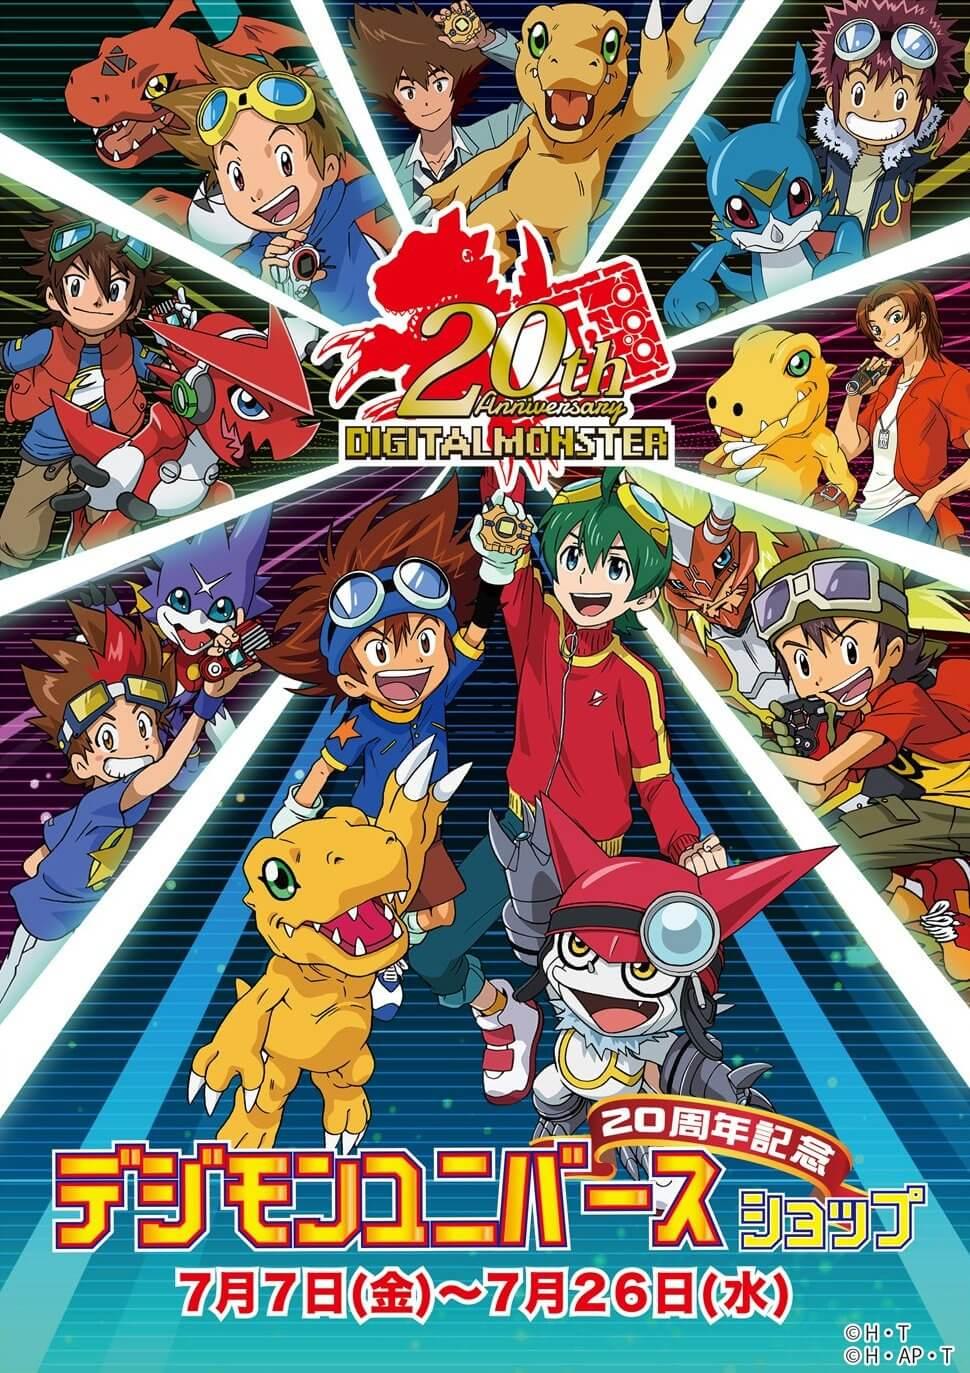 Photo of The Digimon Universe 20th Anniversary Shop!